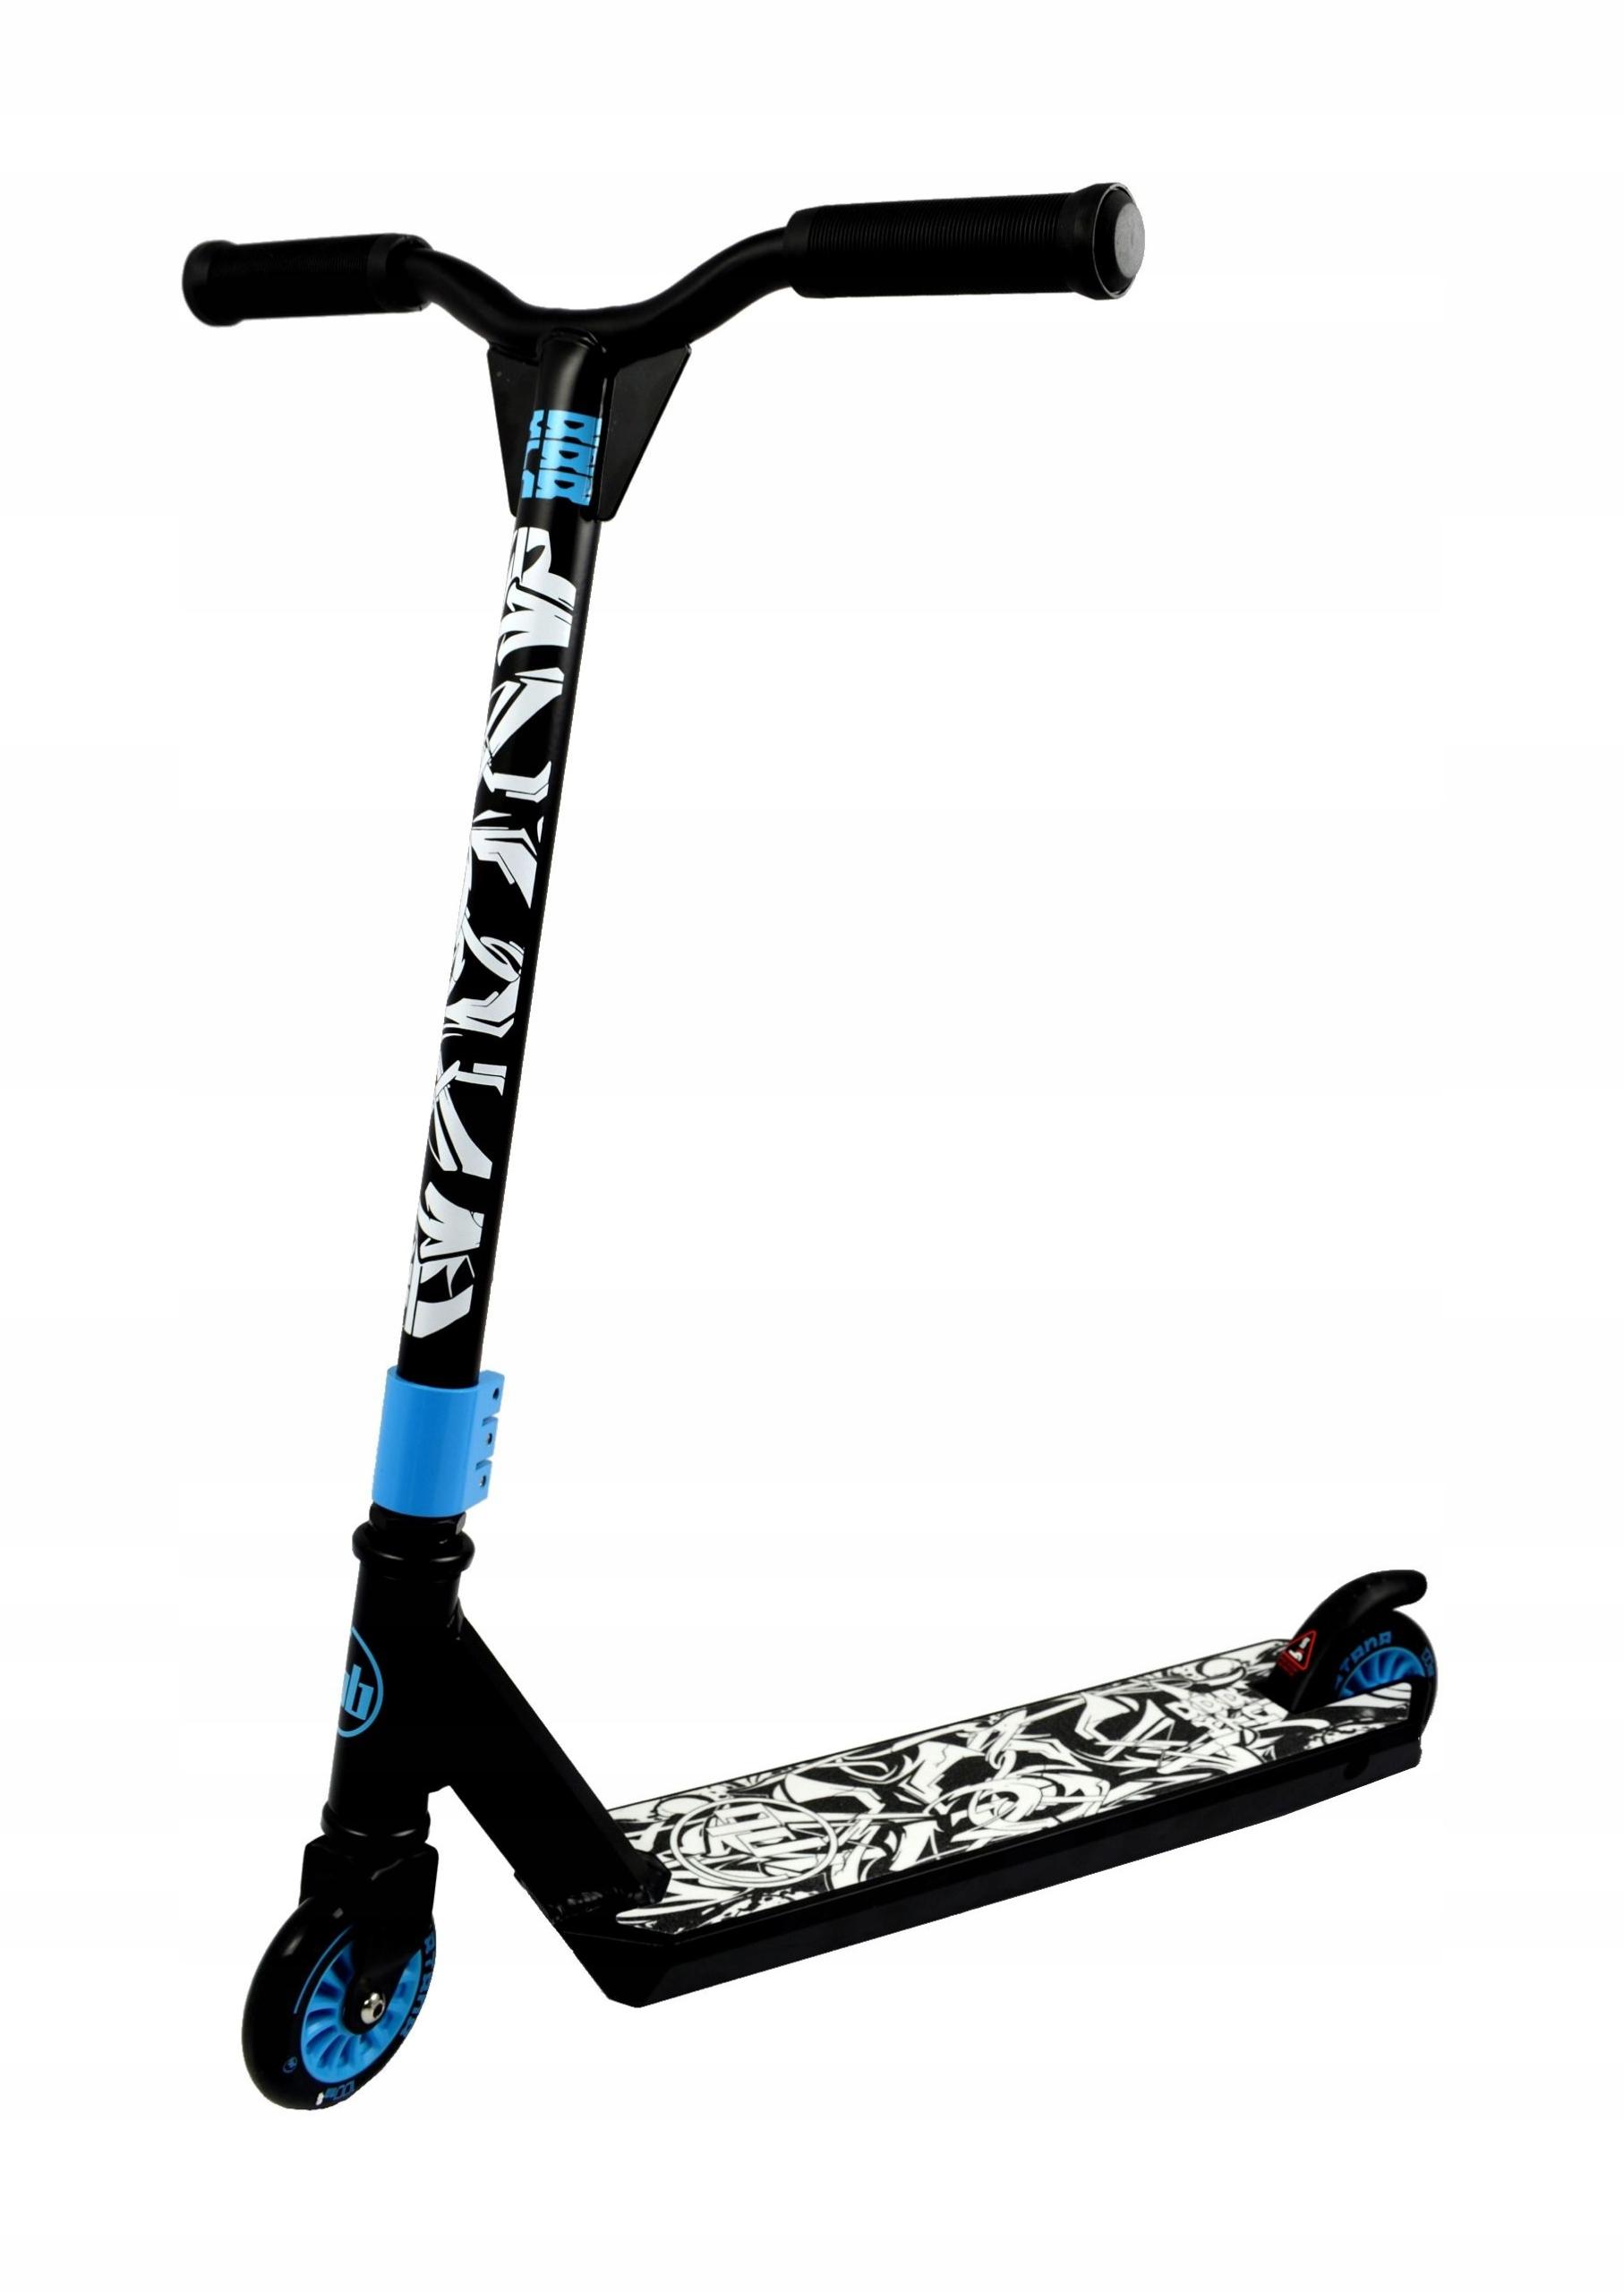 Hulajnoga Freestyle PB Stunt ABEC7 - 120 kg